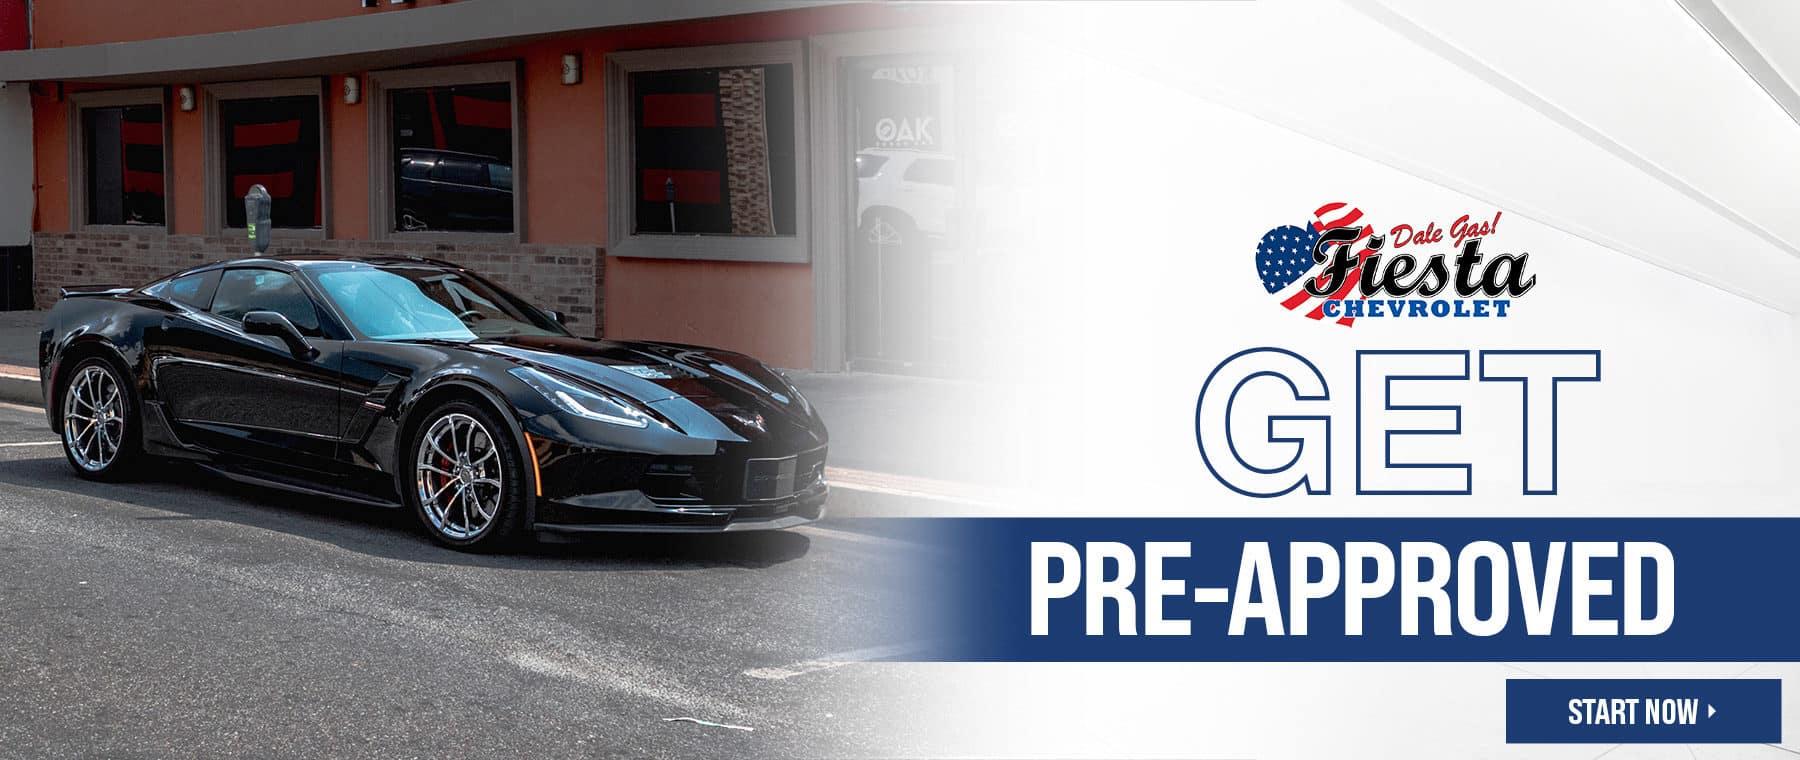 Get Pre-Approved | Fiesta Chevrolet in Edinburg, Texas